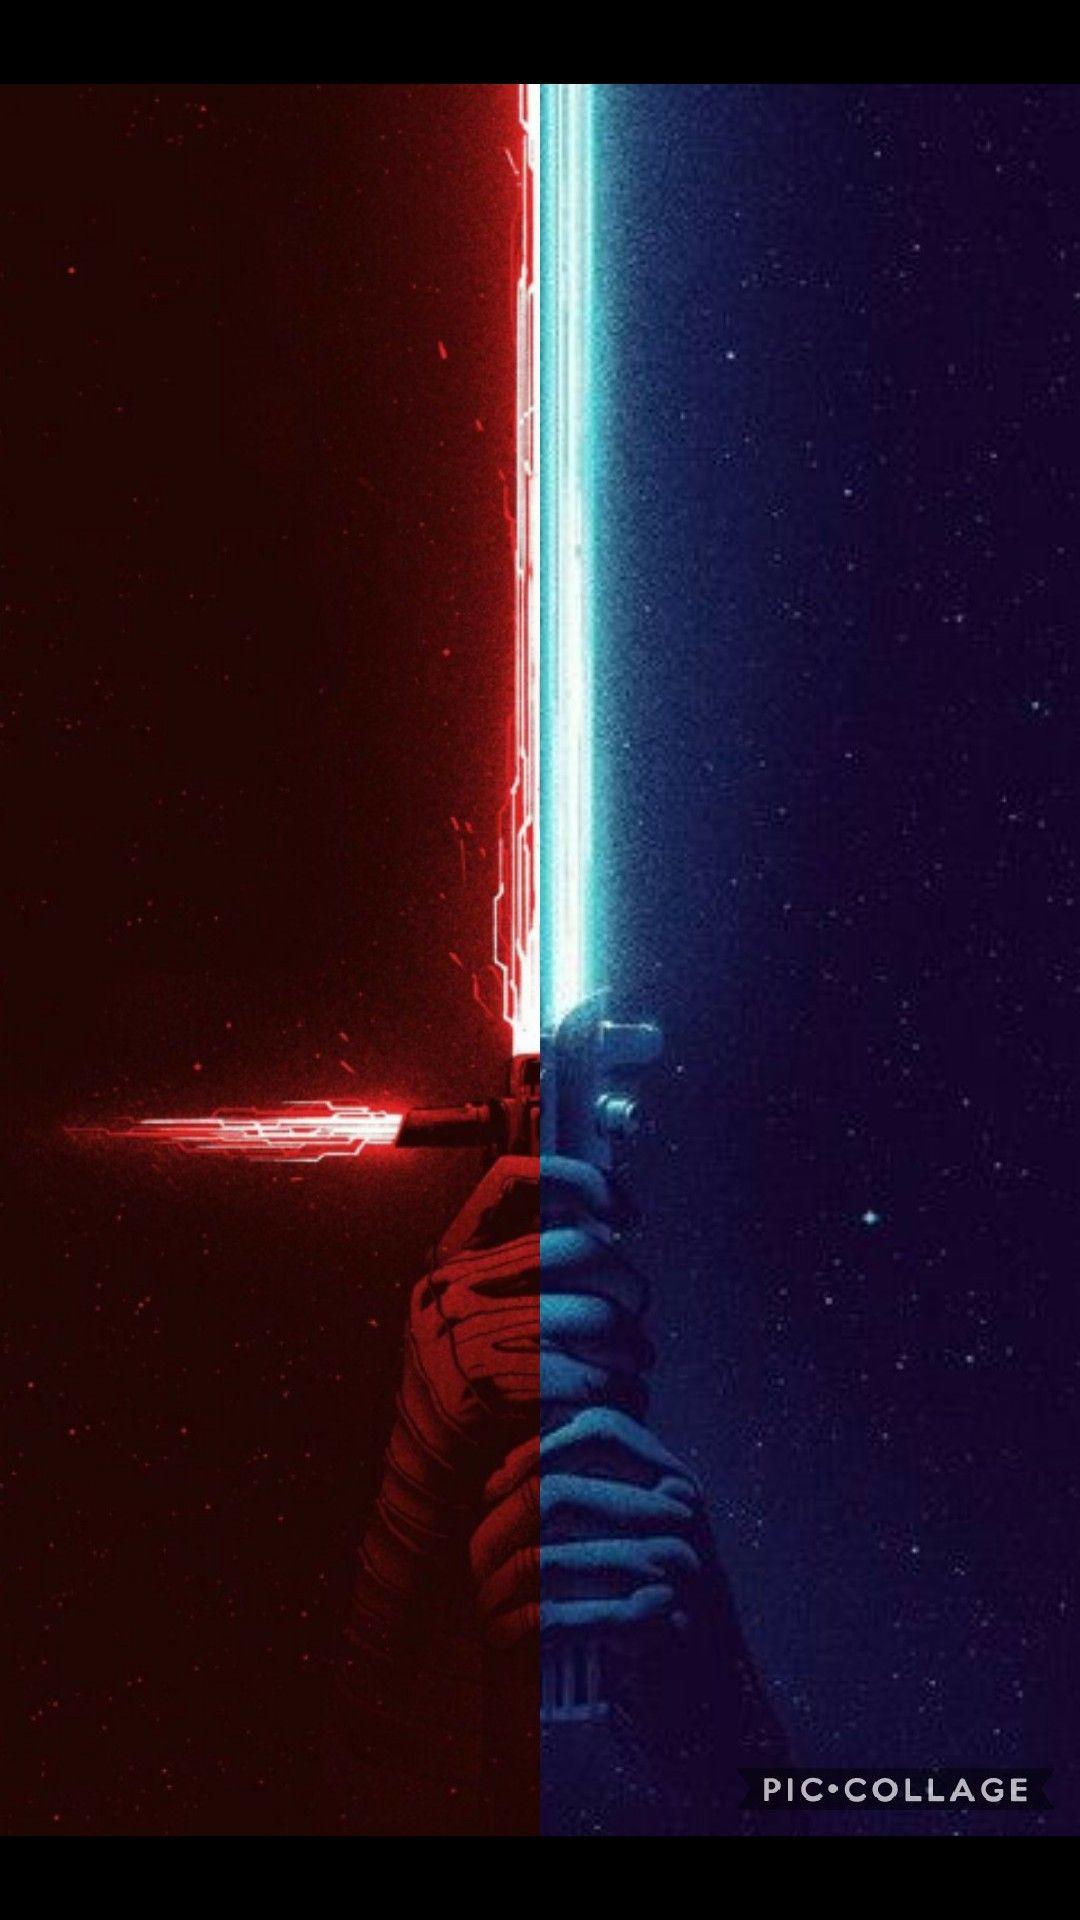 Star Wars Sabre De Luz 1080x1920 Wallpaper Teahub Io